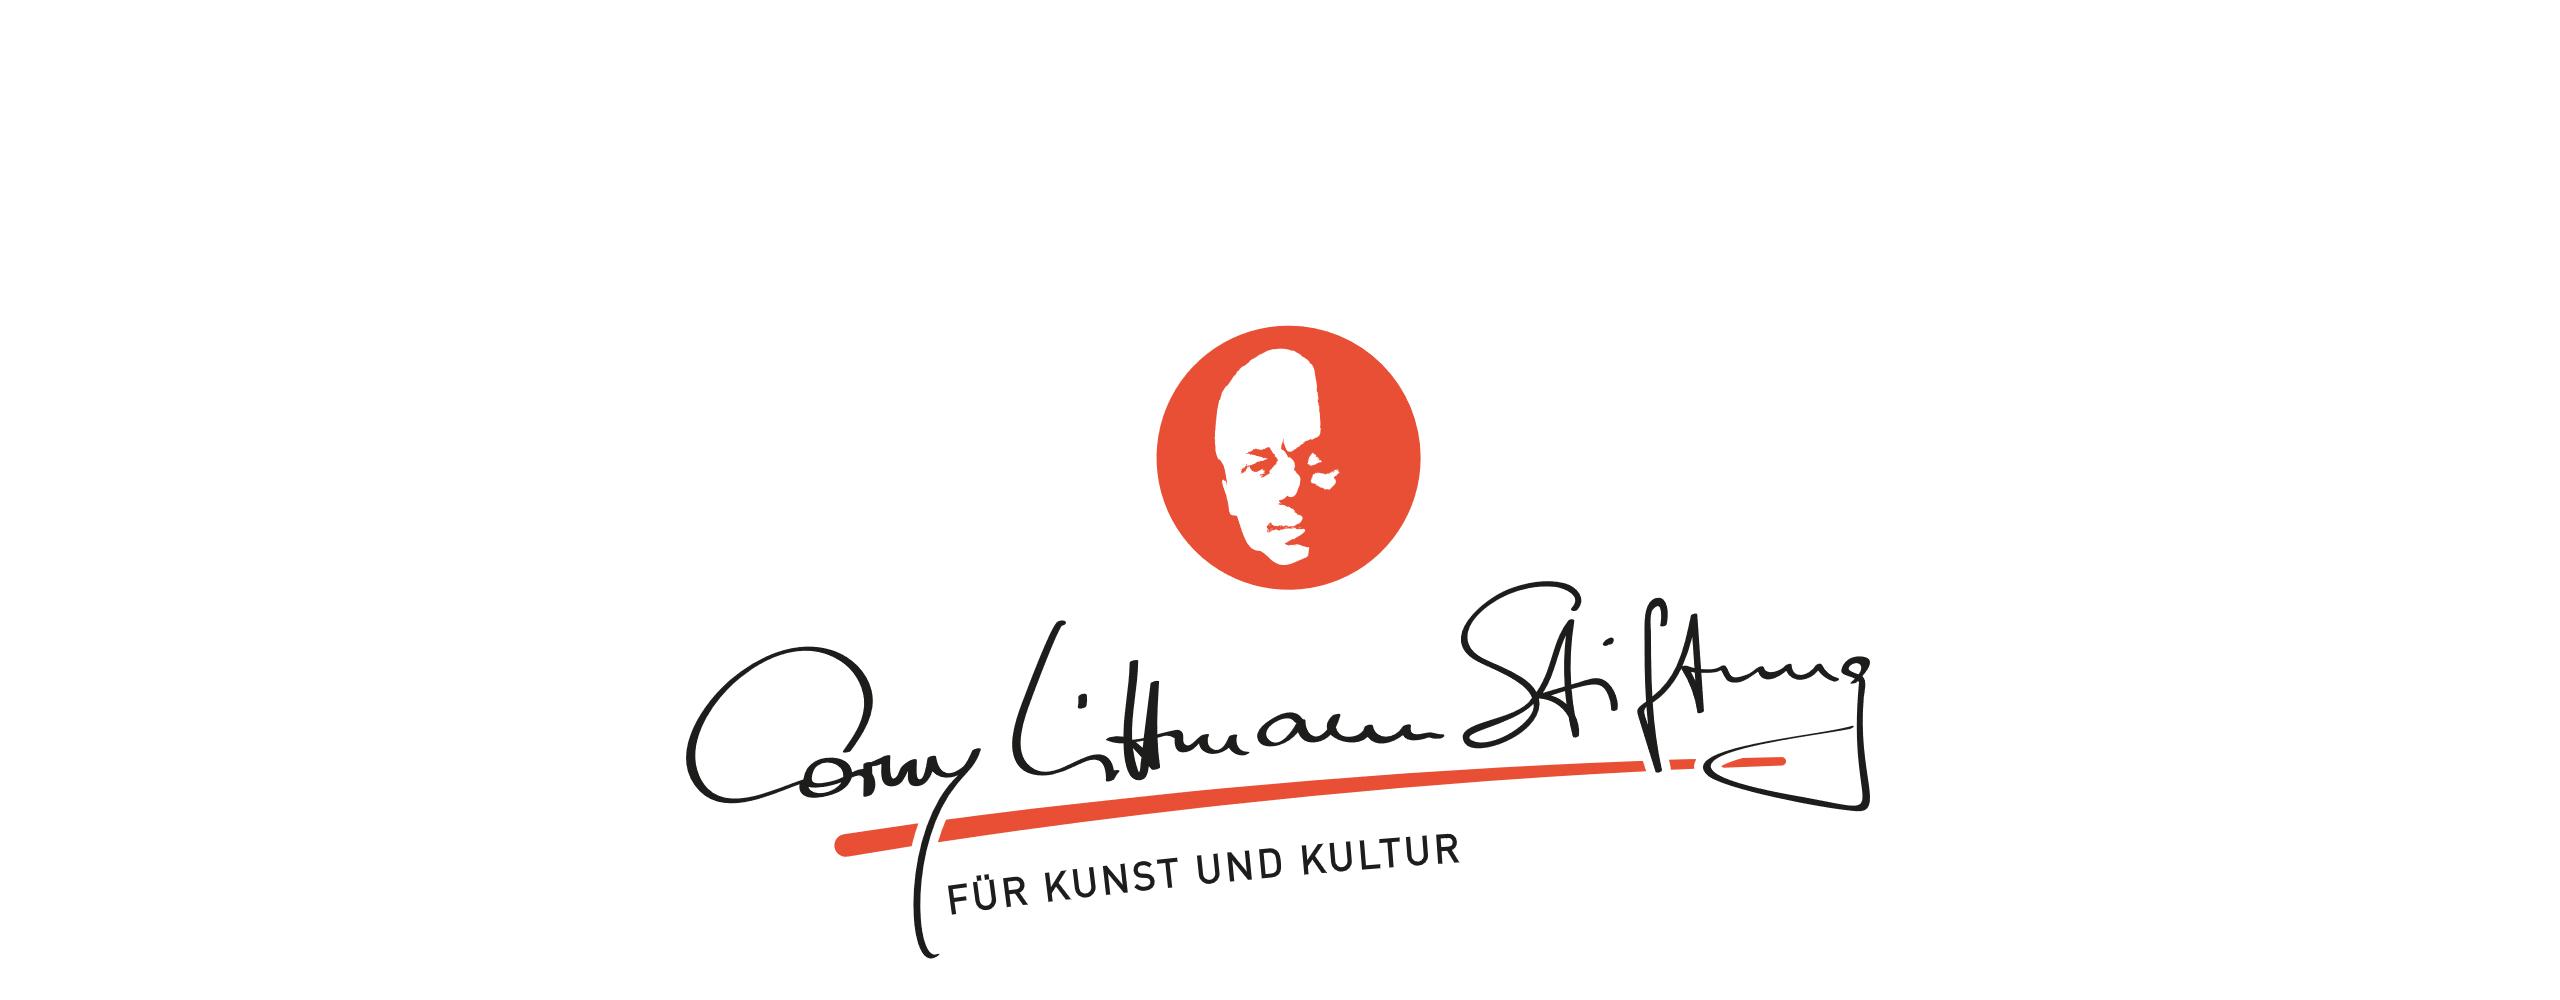 Corny Littmann Stiftung